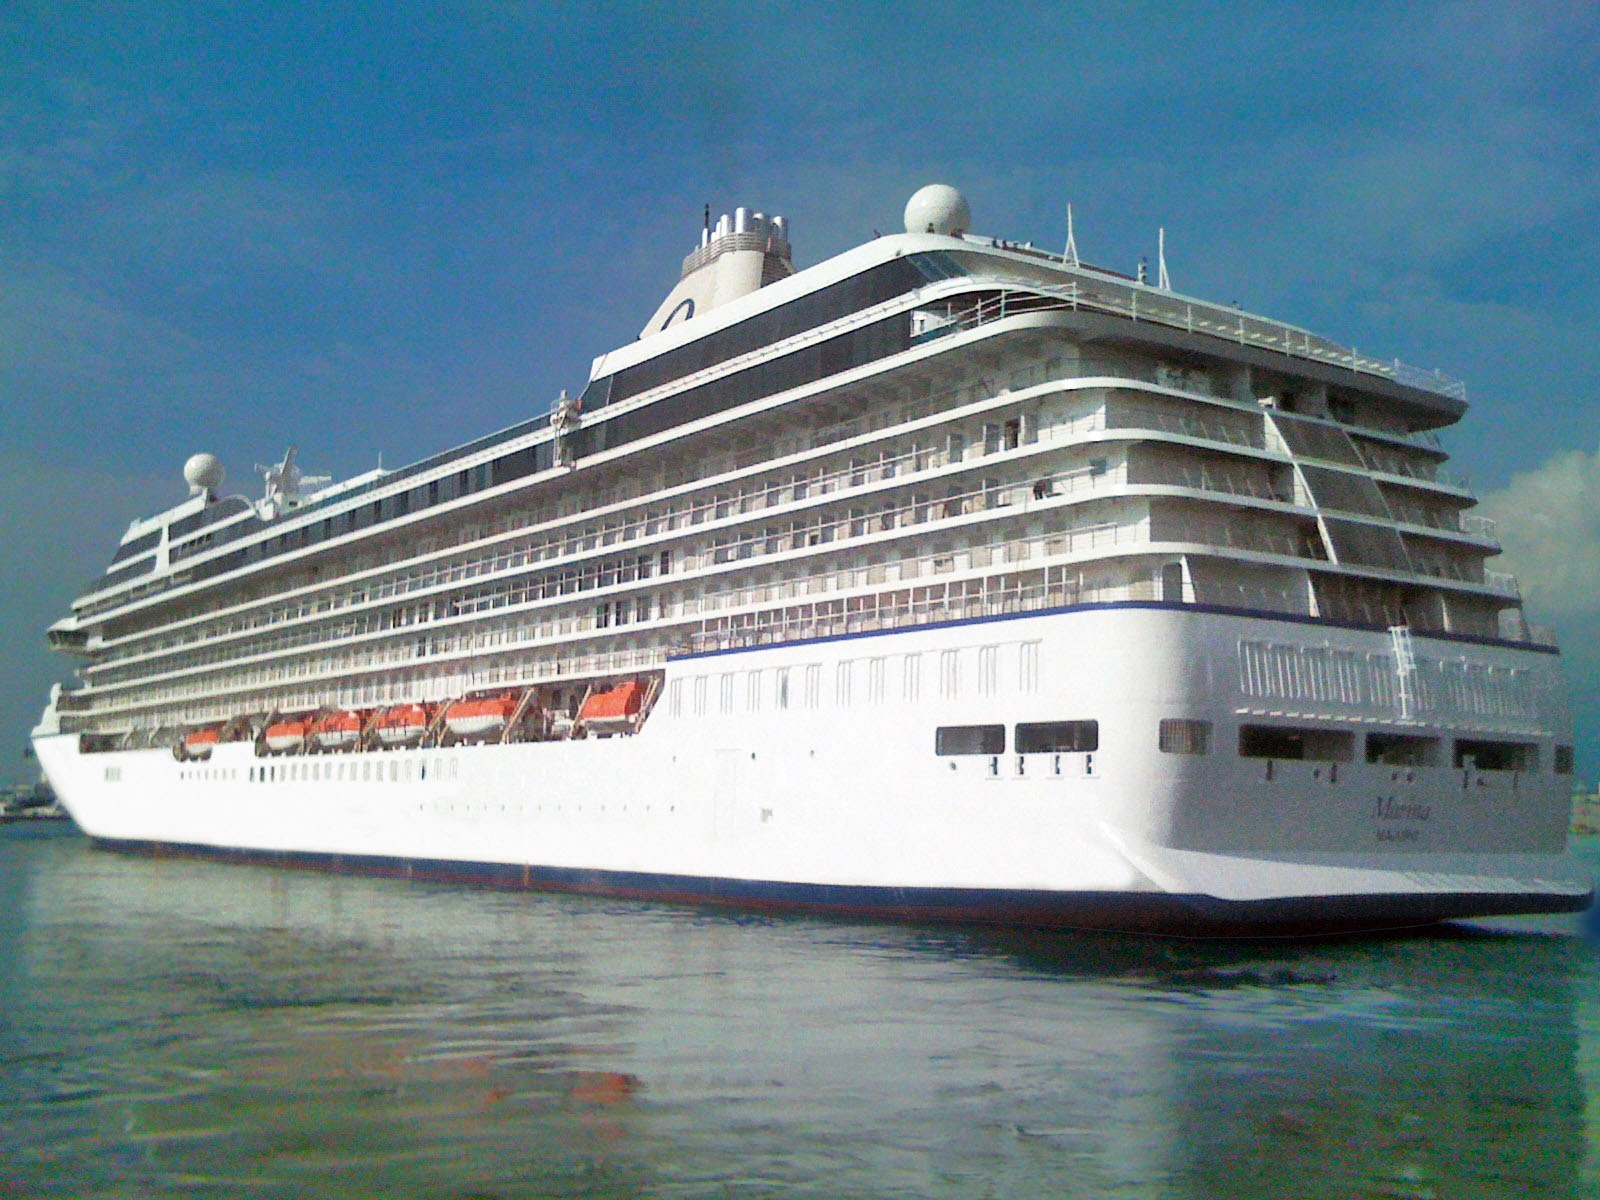 Oceania Marina Has Very Successful Sea Trials